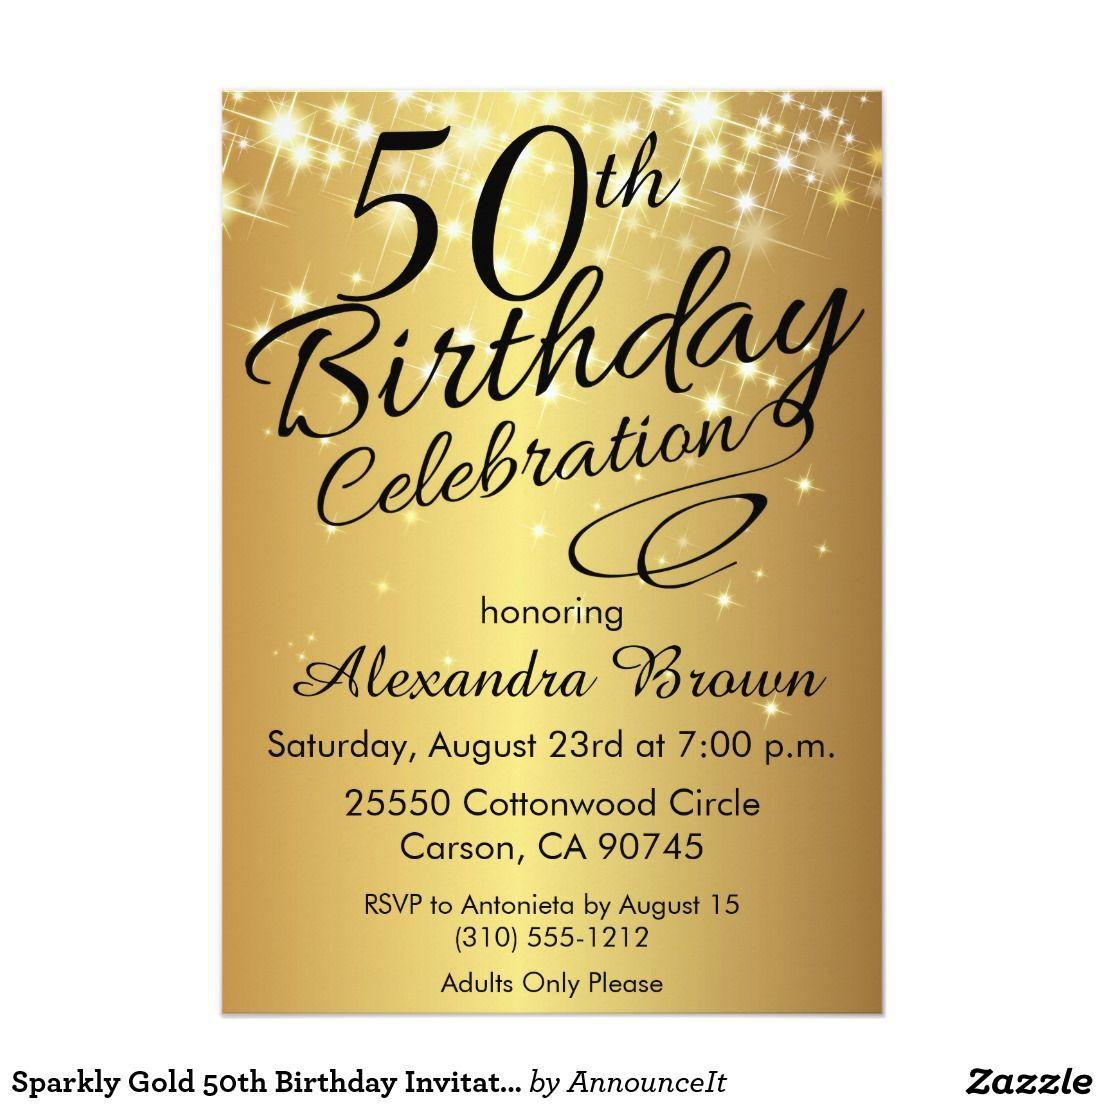 Sparkly Gold 50th Birthday Invitations | 50th birthday invitations ...